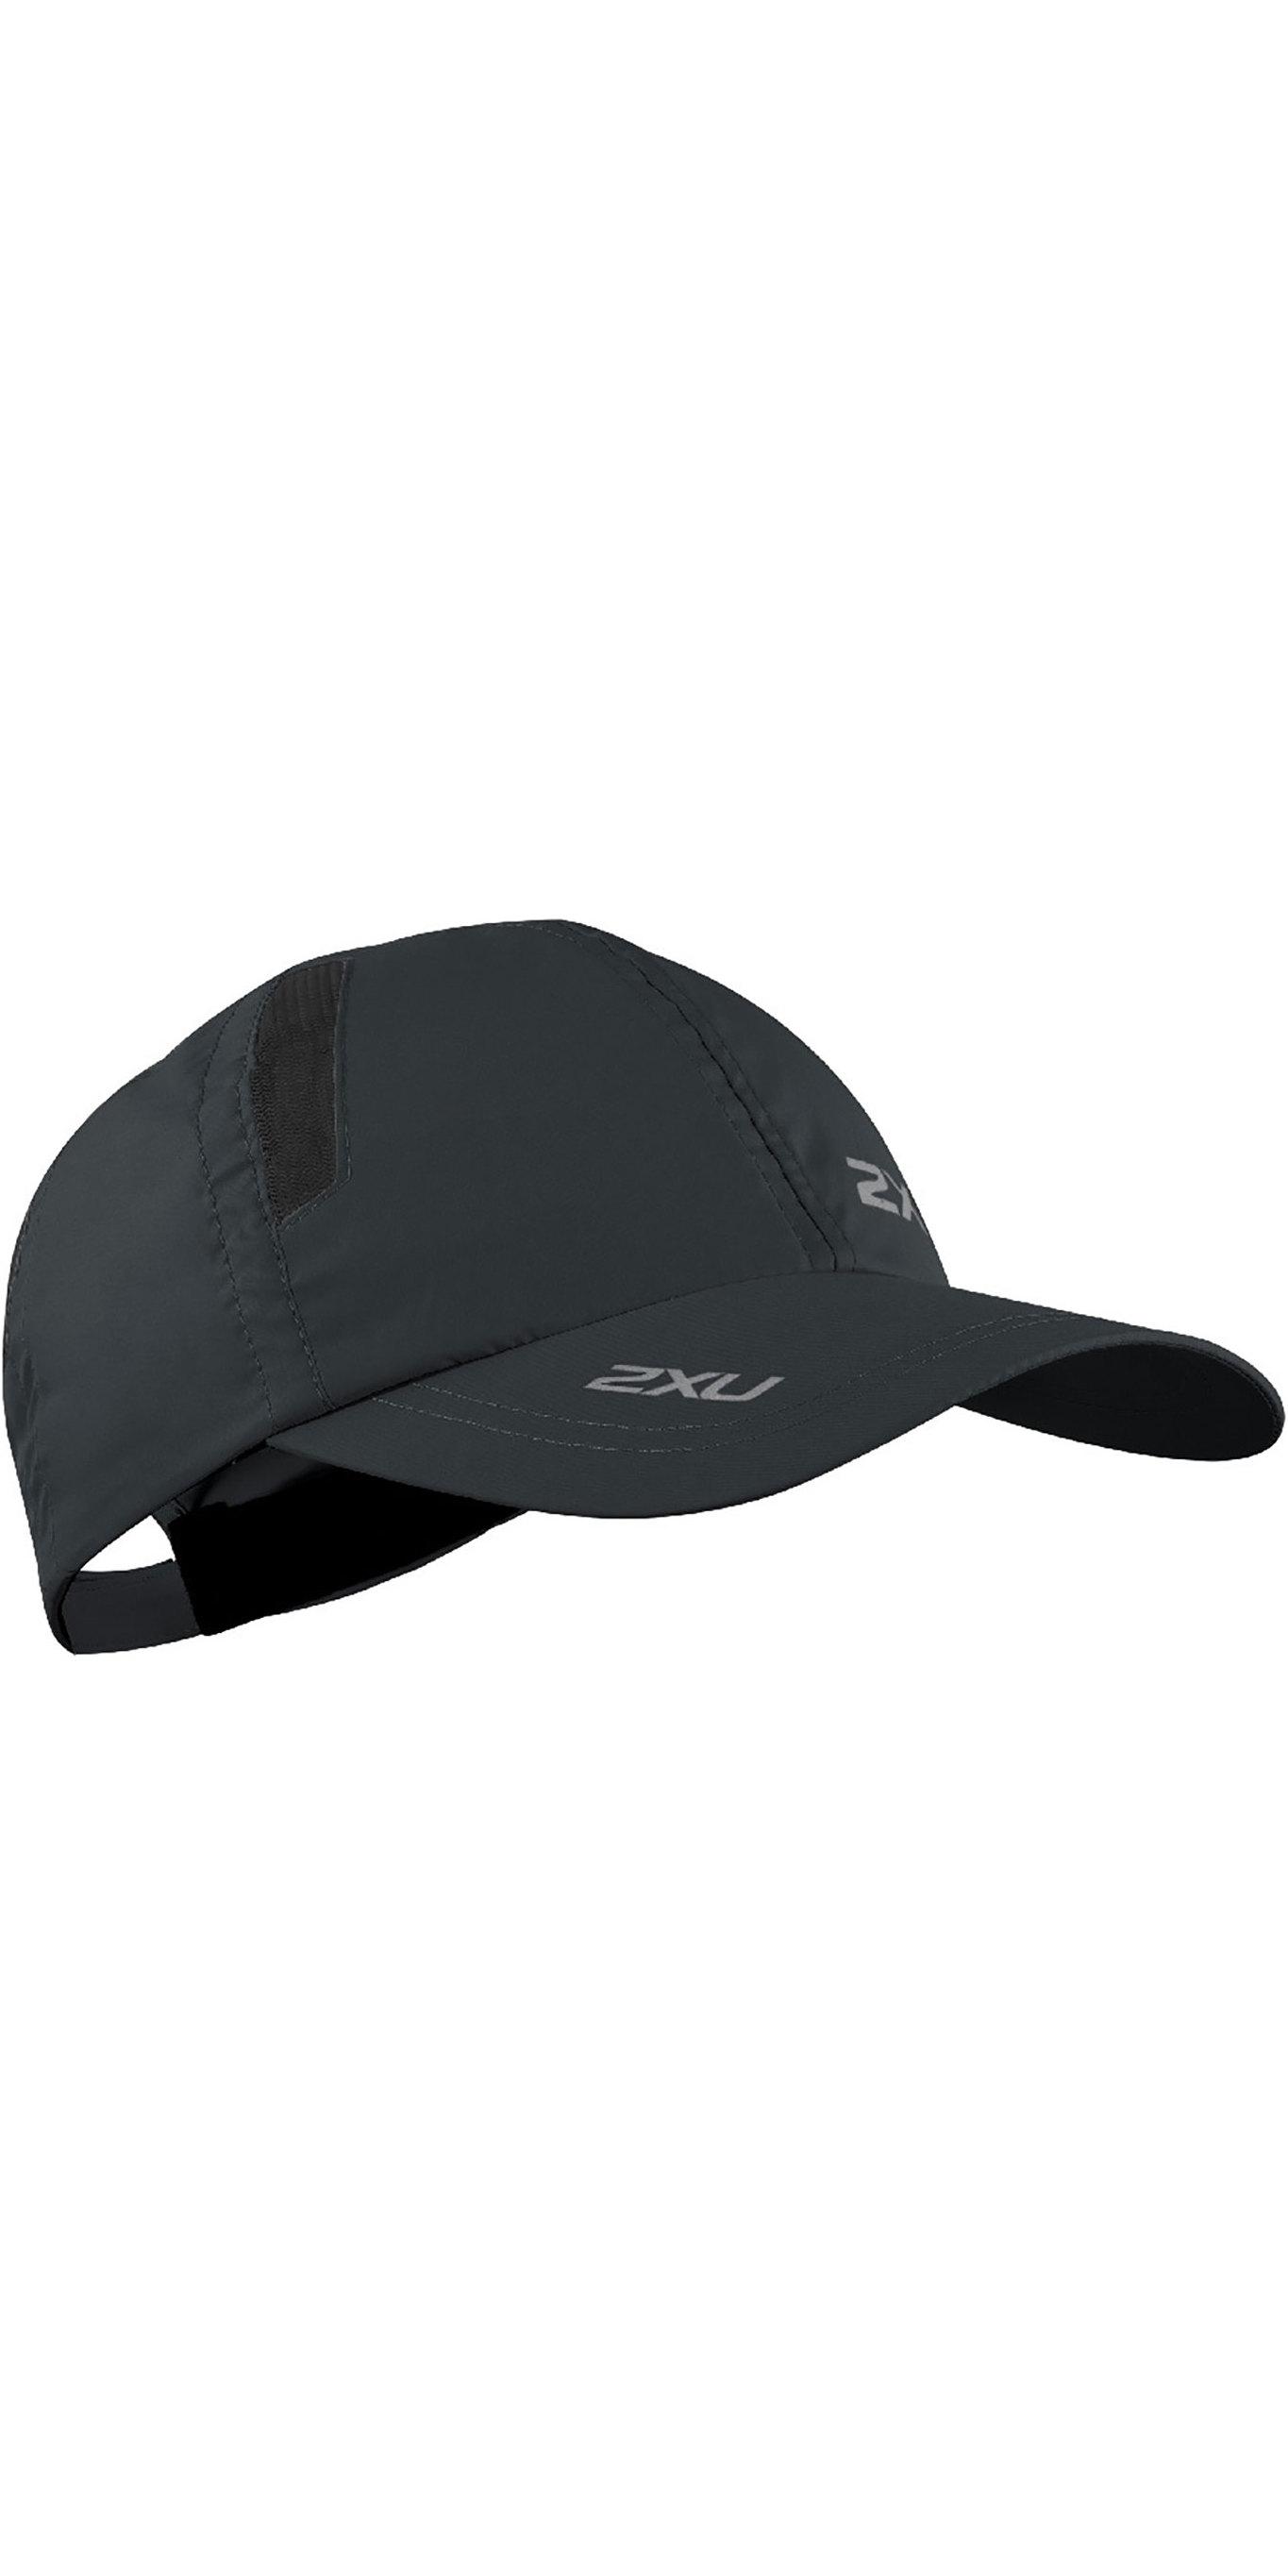 4c0dff3c3c1e7 2019 2XU Run Cap Black Uq5685f - Technical Hats Caps   Visors - Gloves  Hoods   Hats